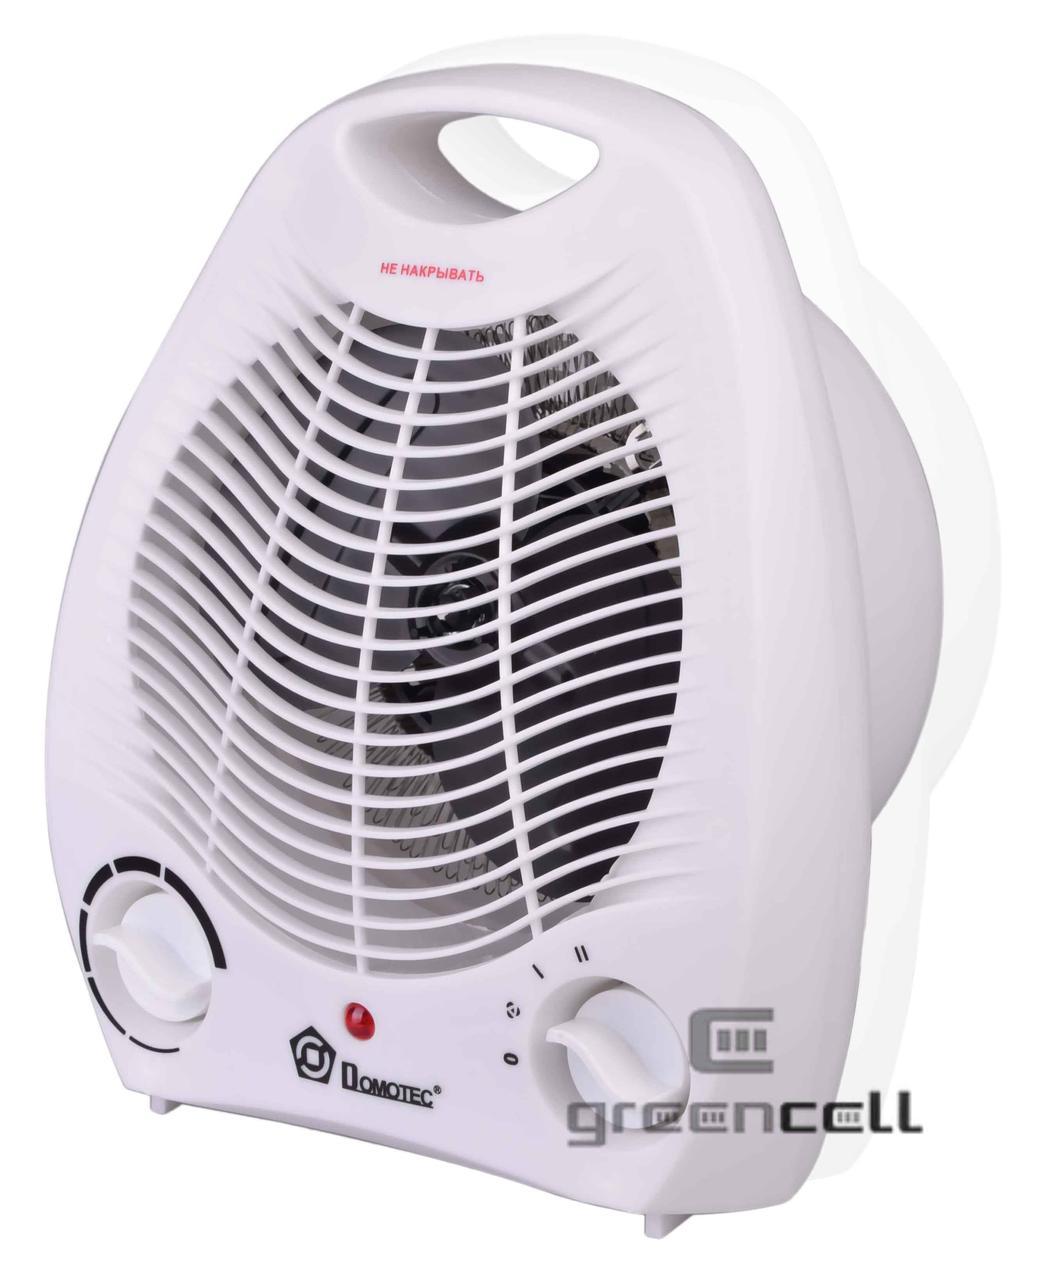 Тепловентилятор Domotec MS H 0001